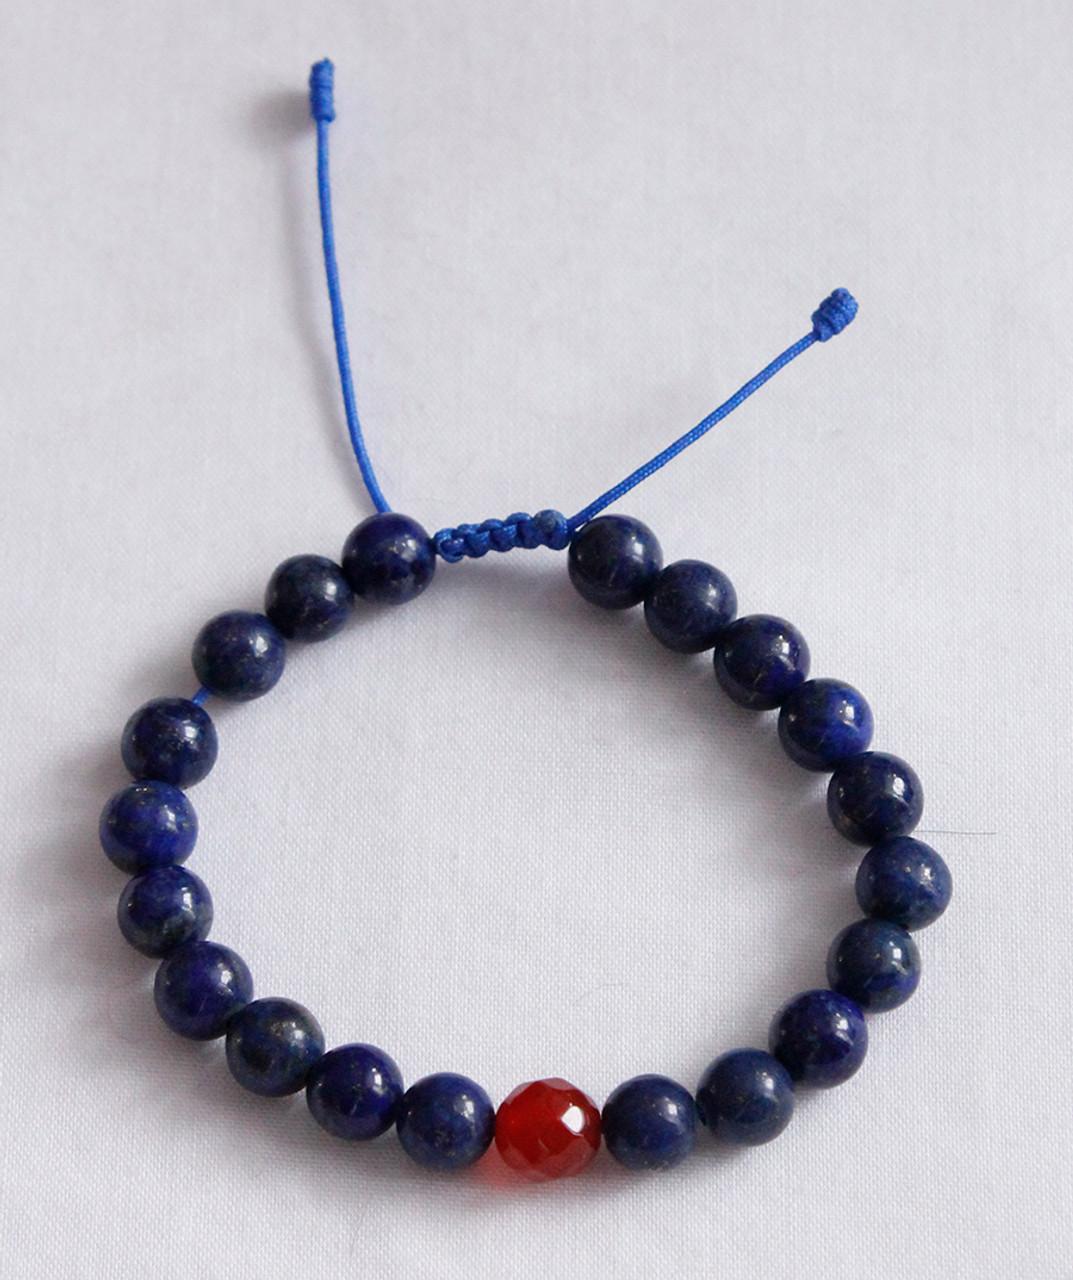 Tibetan handmade bracelet